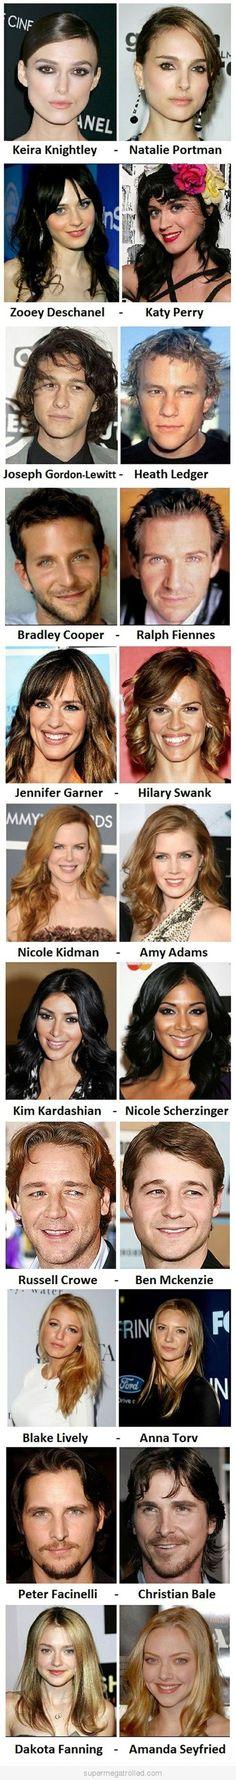 Celebrities That Look Like Celebrities